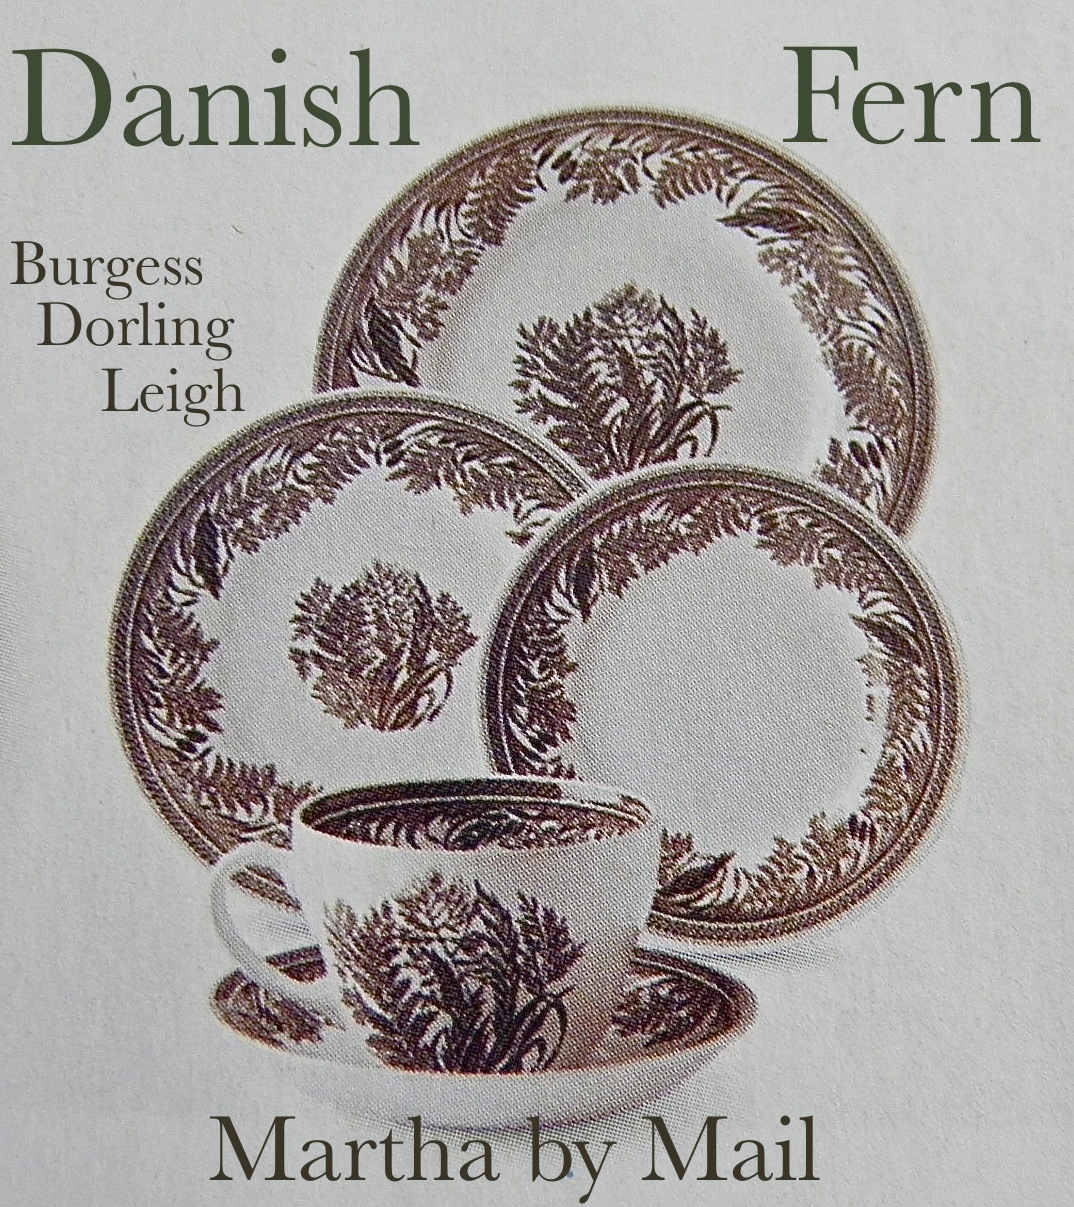 Good Things By David Martha By Mail Danish Fern China